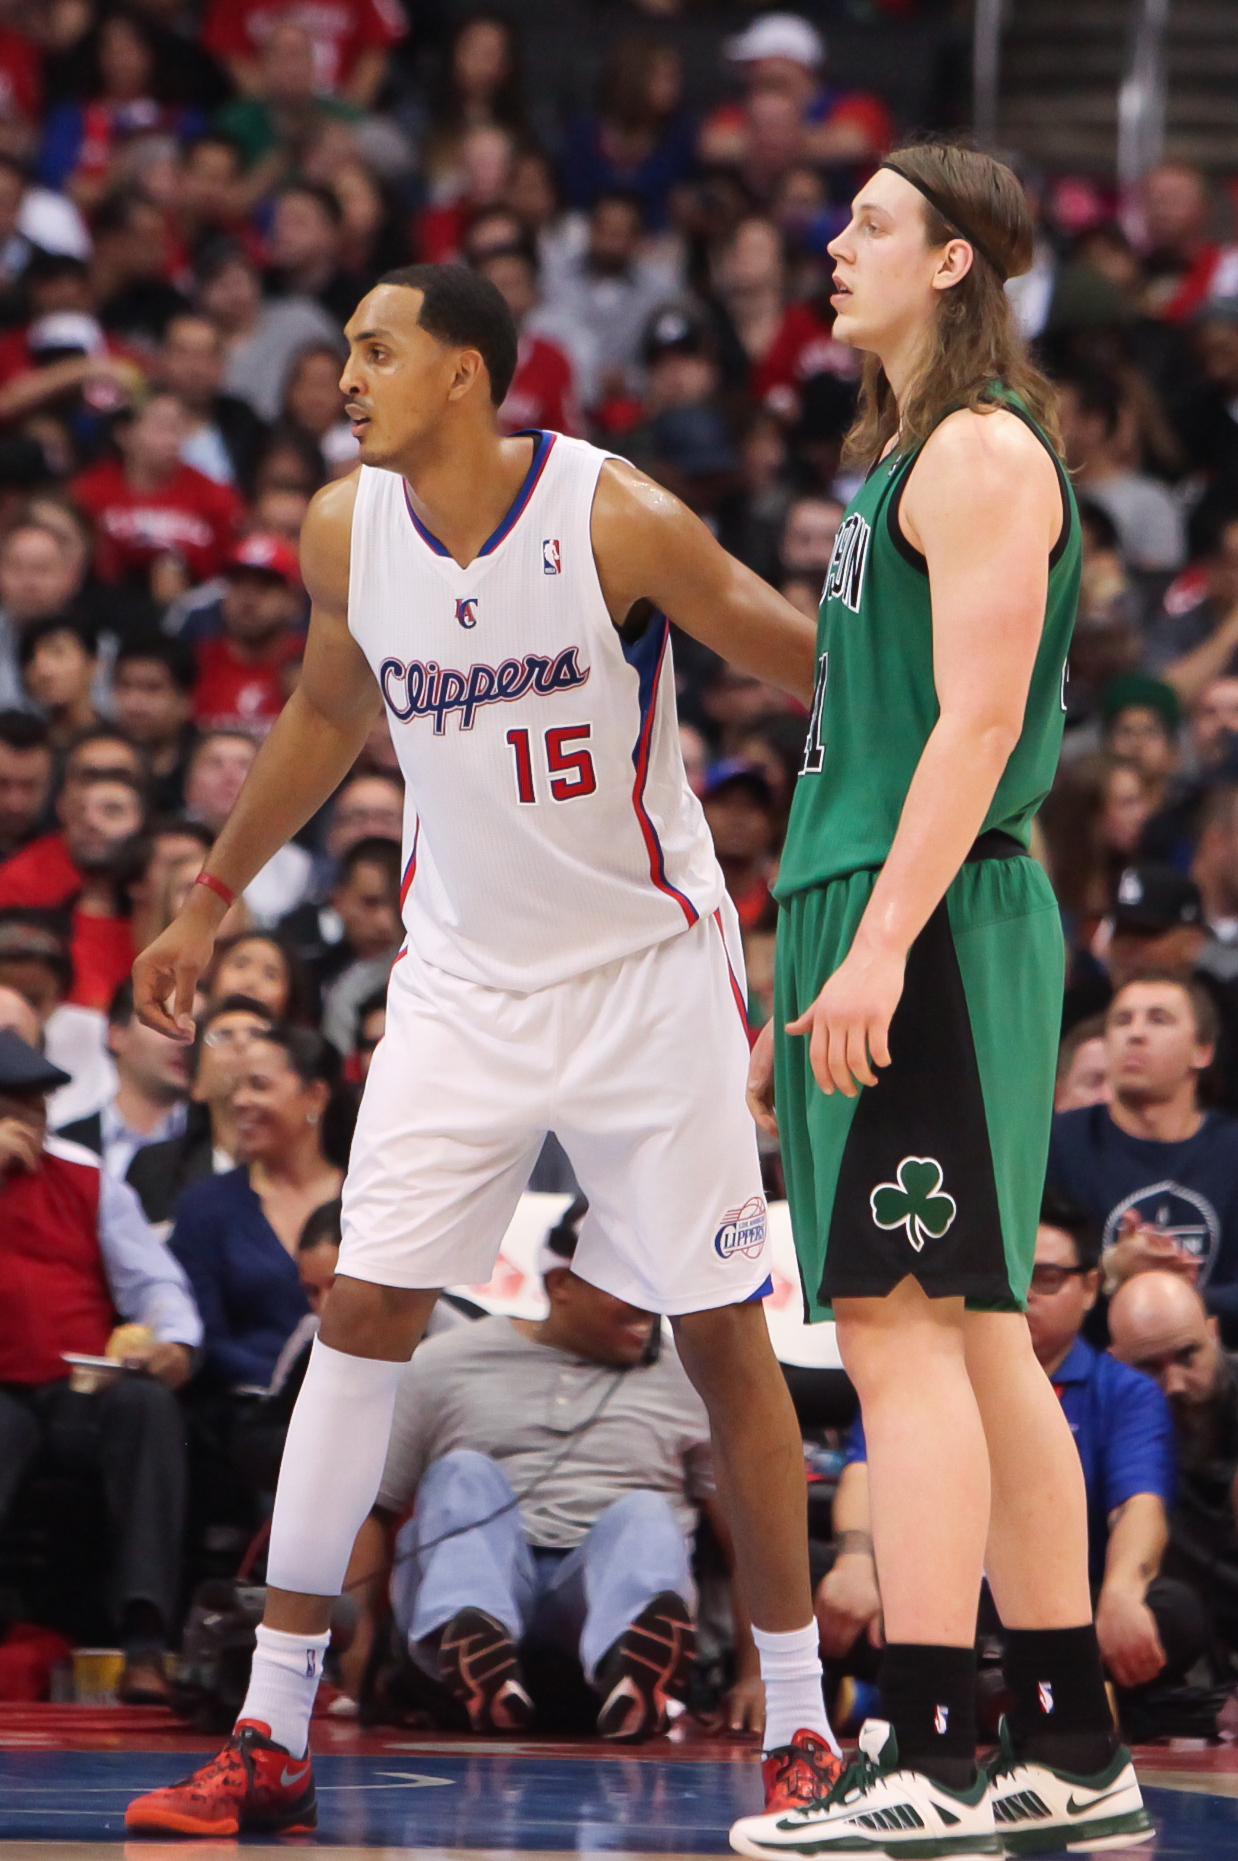 Photo by Varon P. Celtics-62.jpg